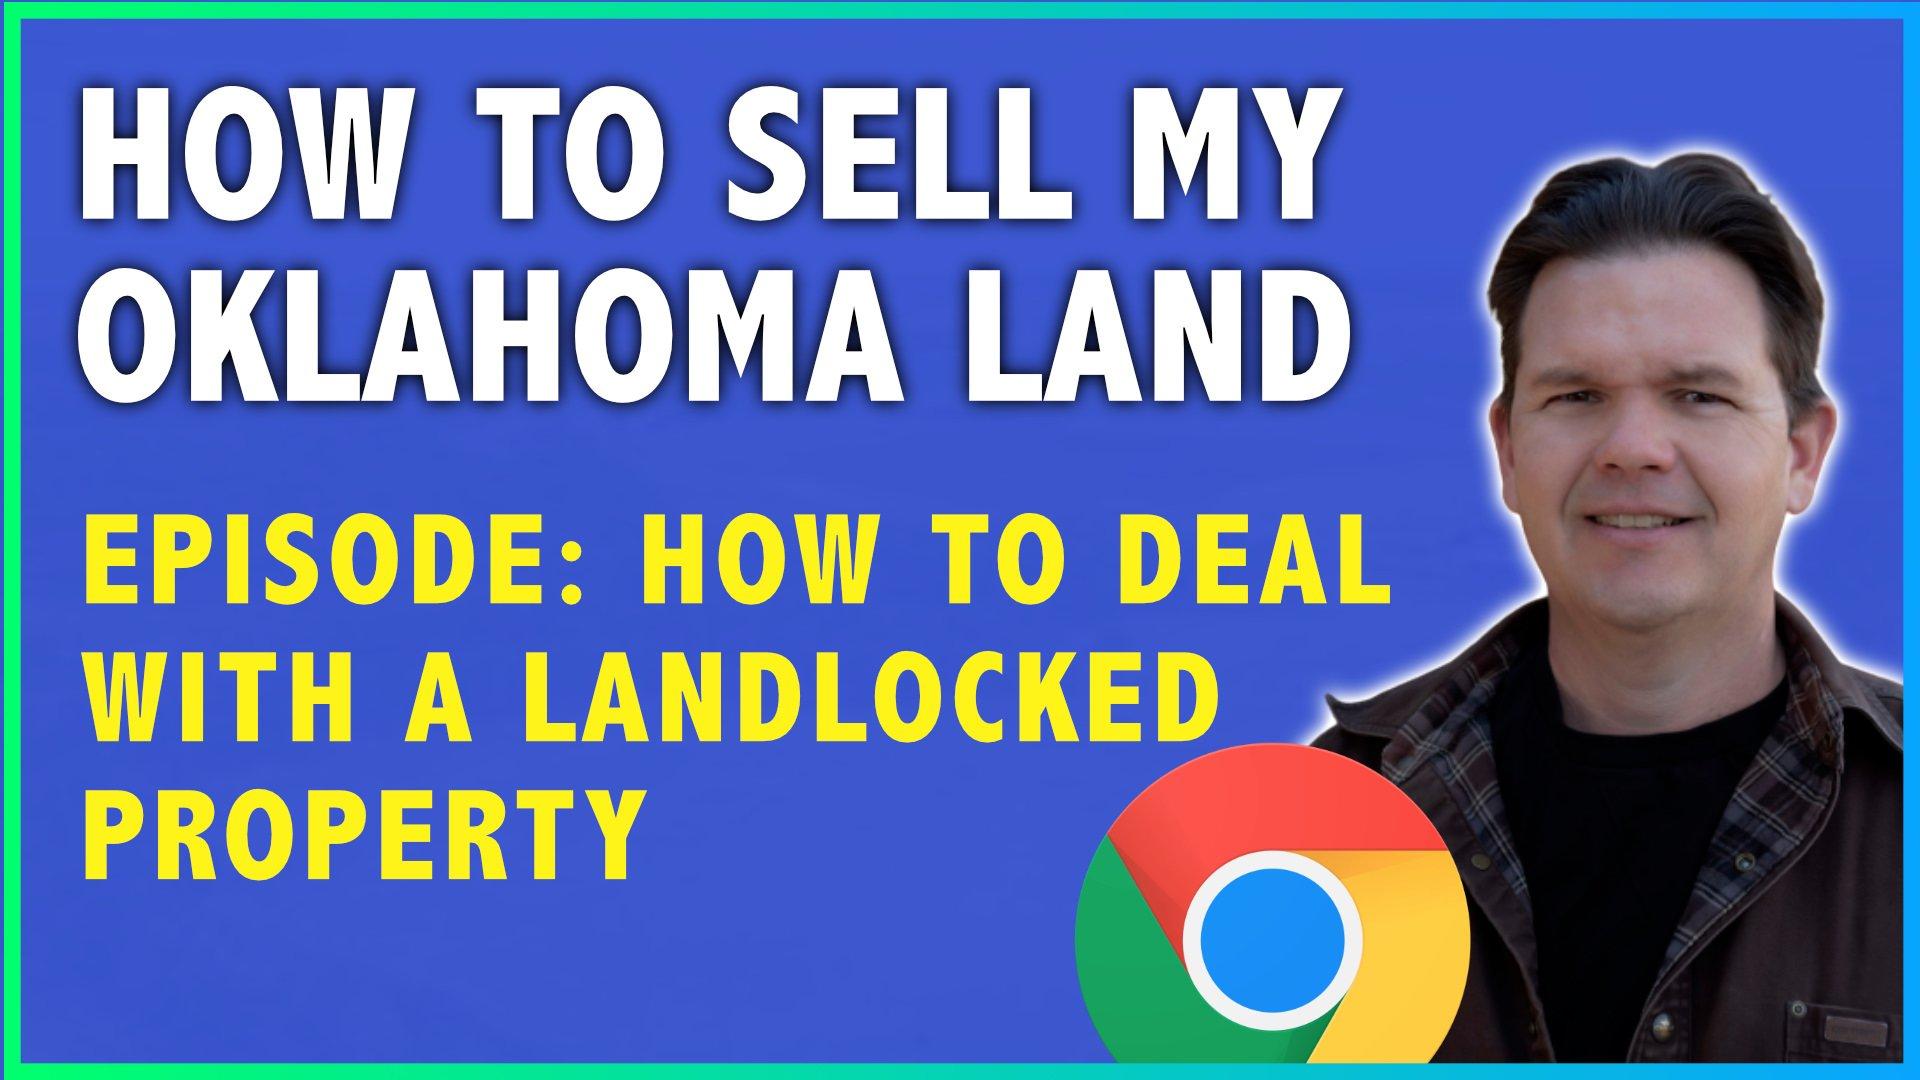 SELL MY LAND OKLAHOMA LANDLOCKED, Checklands